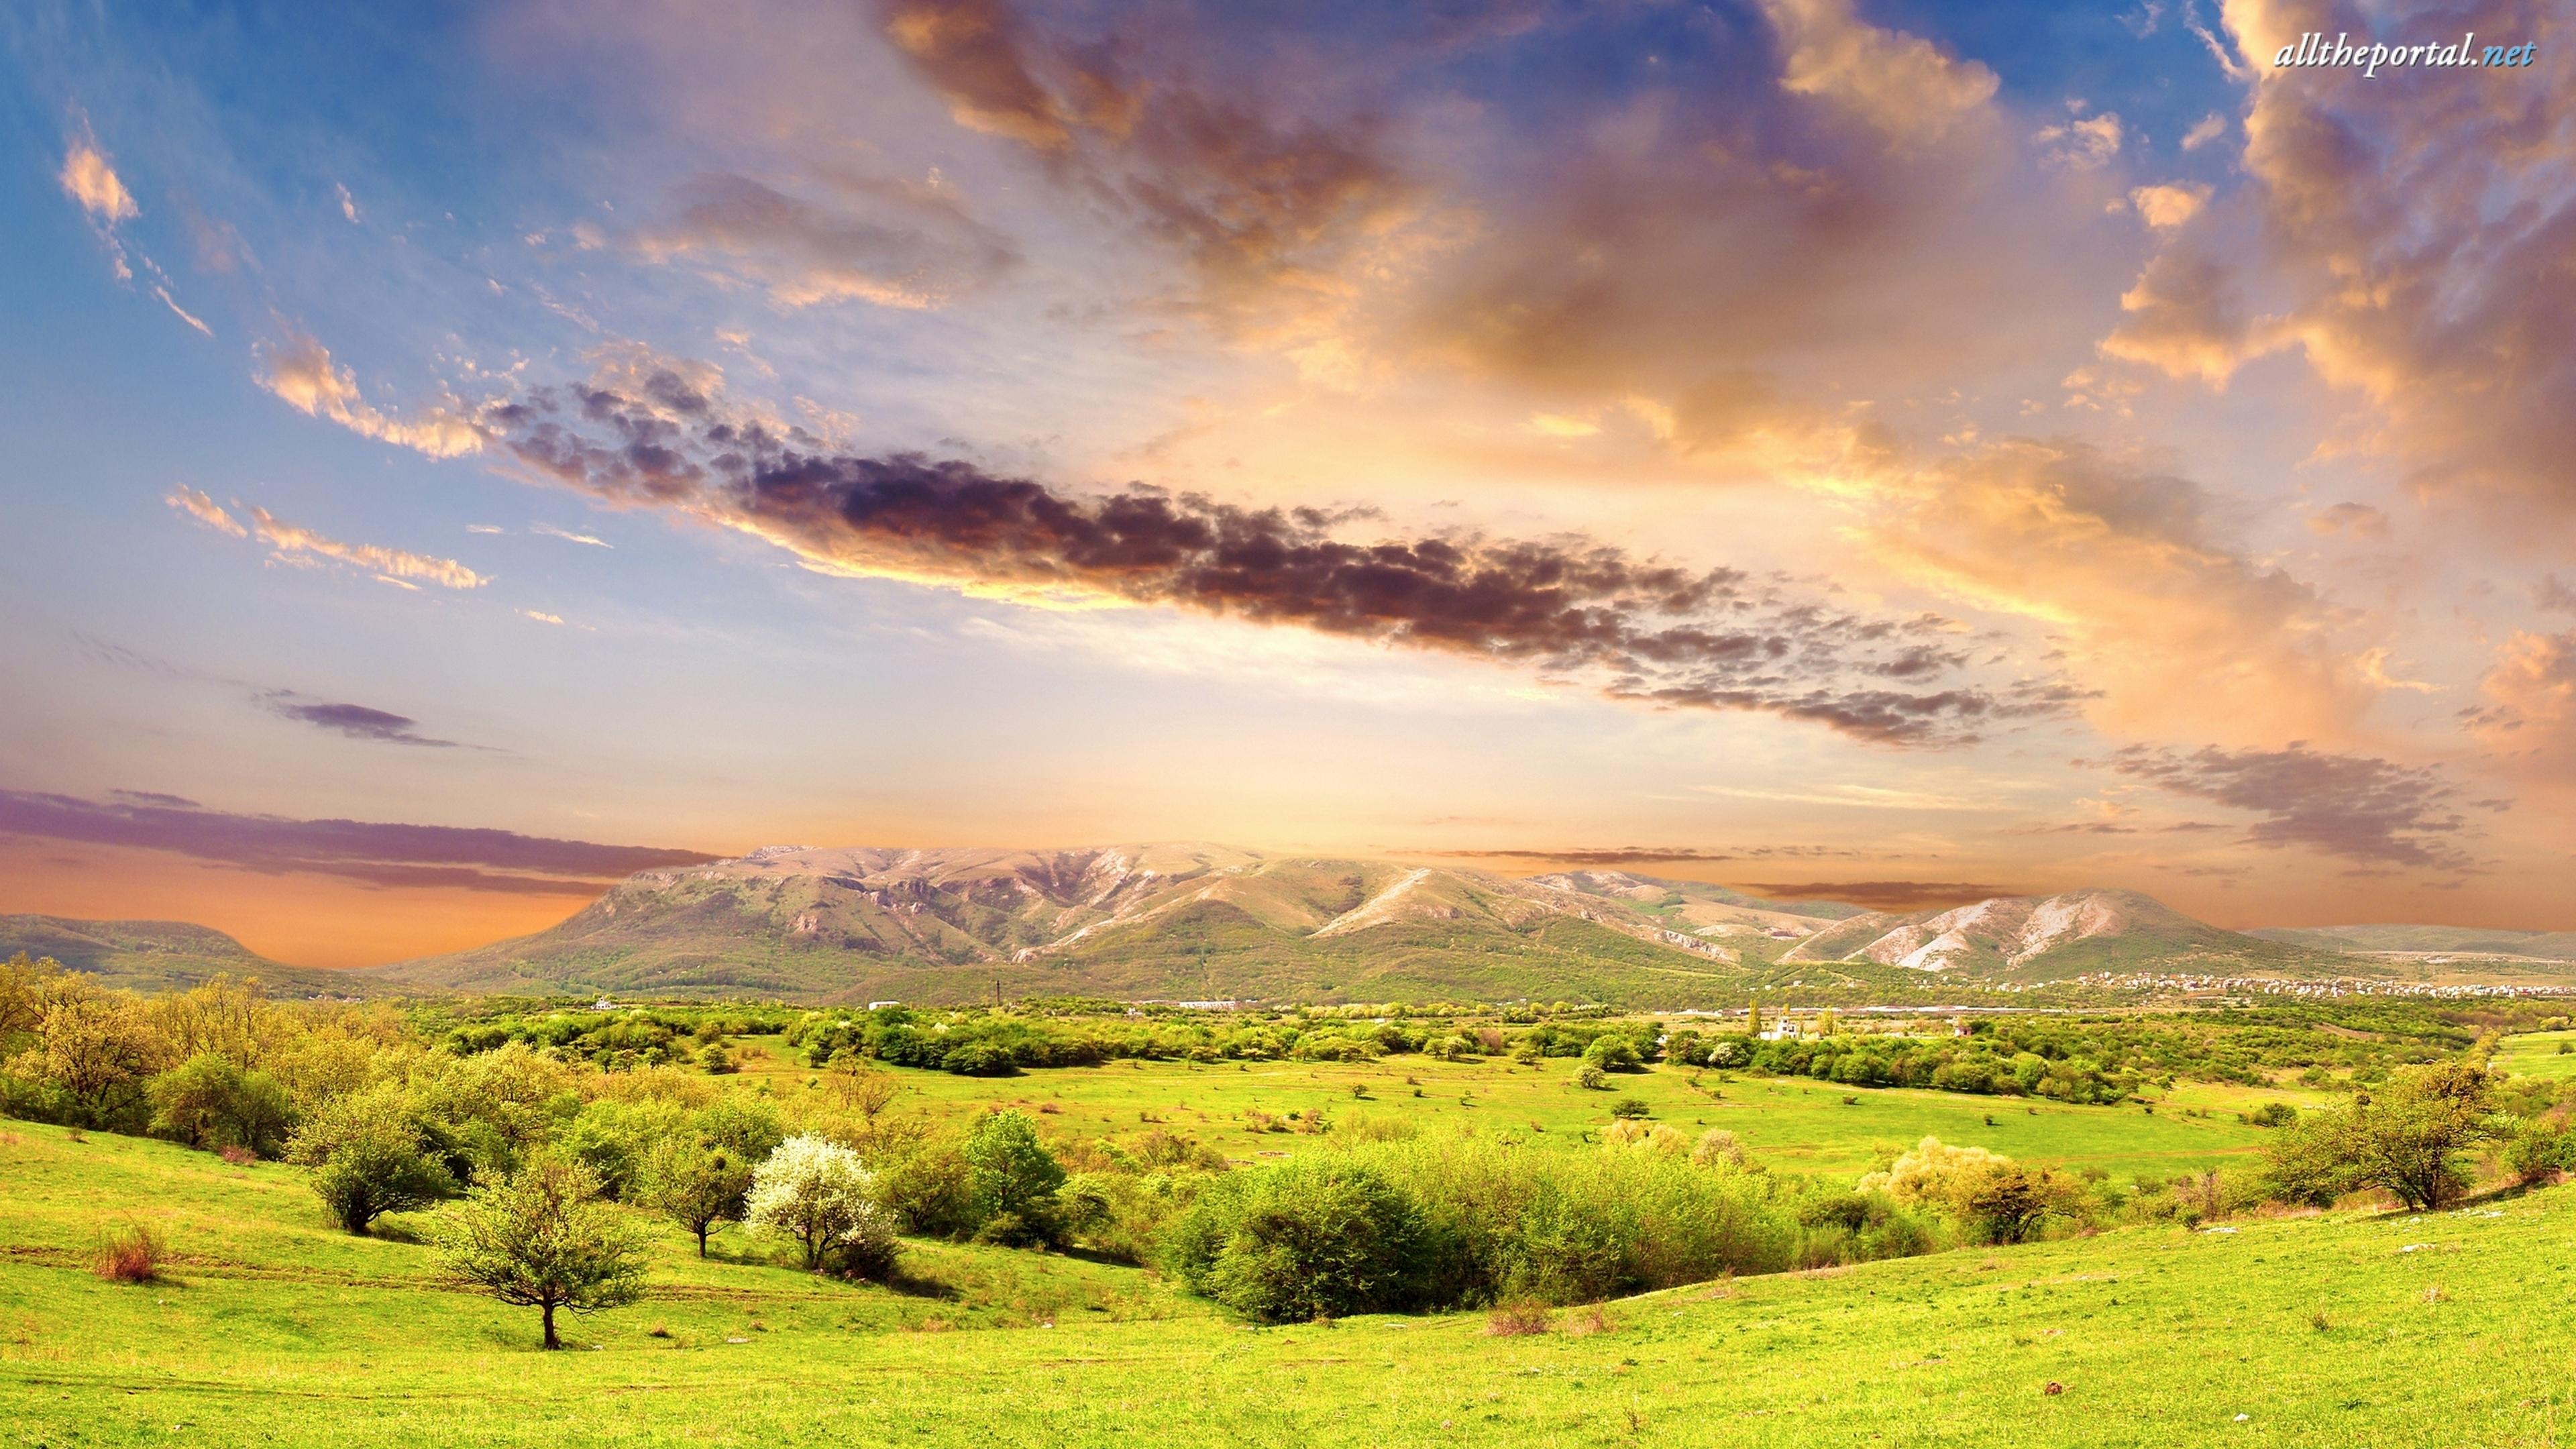 ALLTHEPORTAL.NET_Impressive Ultra HD Landscape Wallpaper (77).jpg